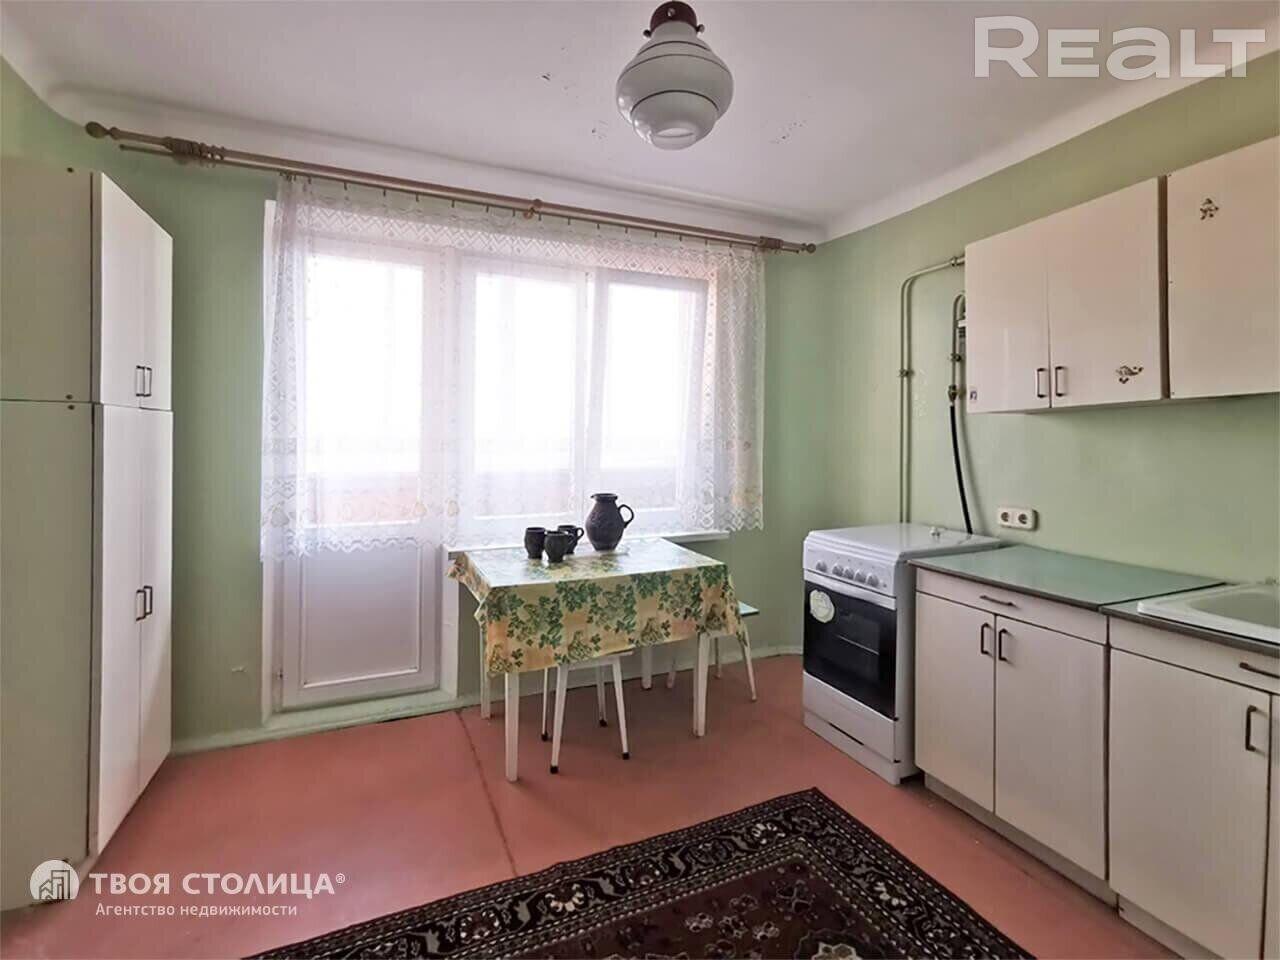 Продажа 3-х комнатной квартиры в г. Минске, проезд Ташкентский, дом 6-2 (р-н Чижовка). Цена 174 209 руб